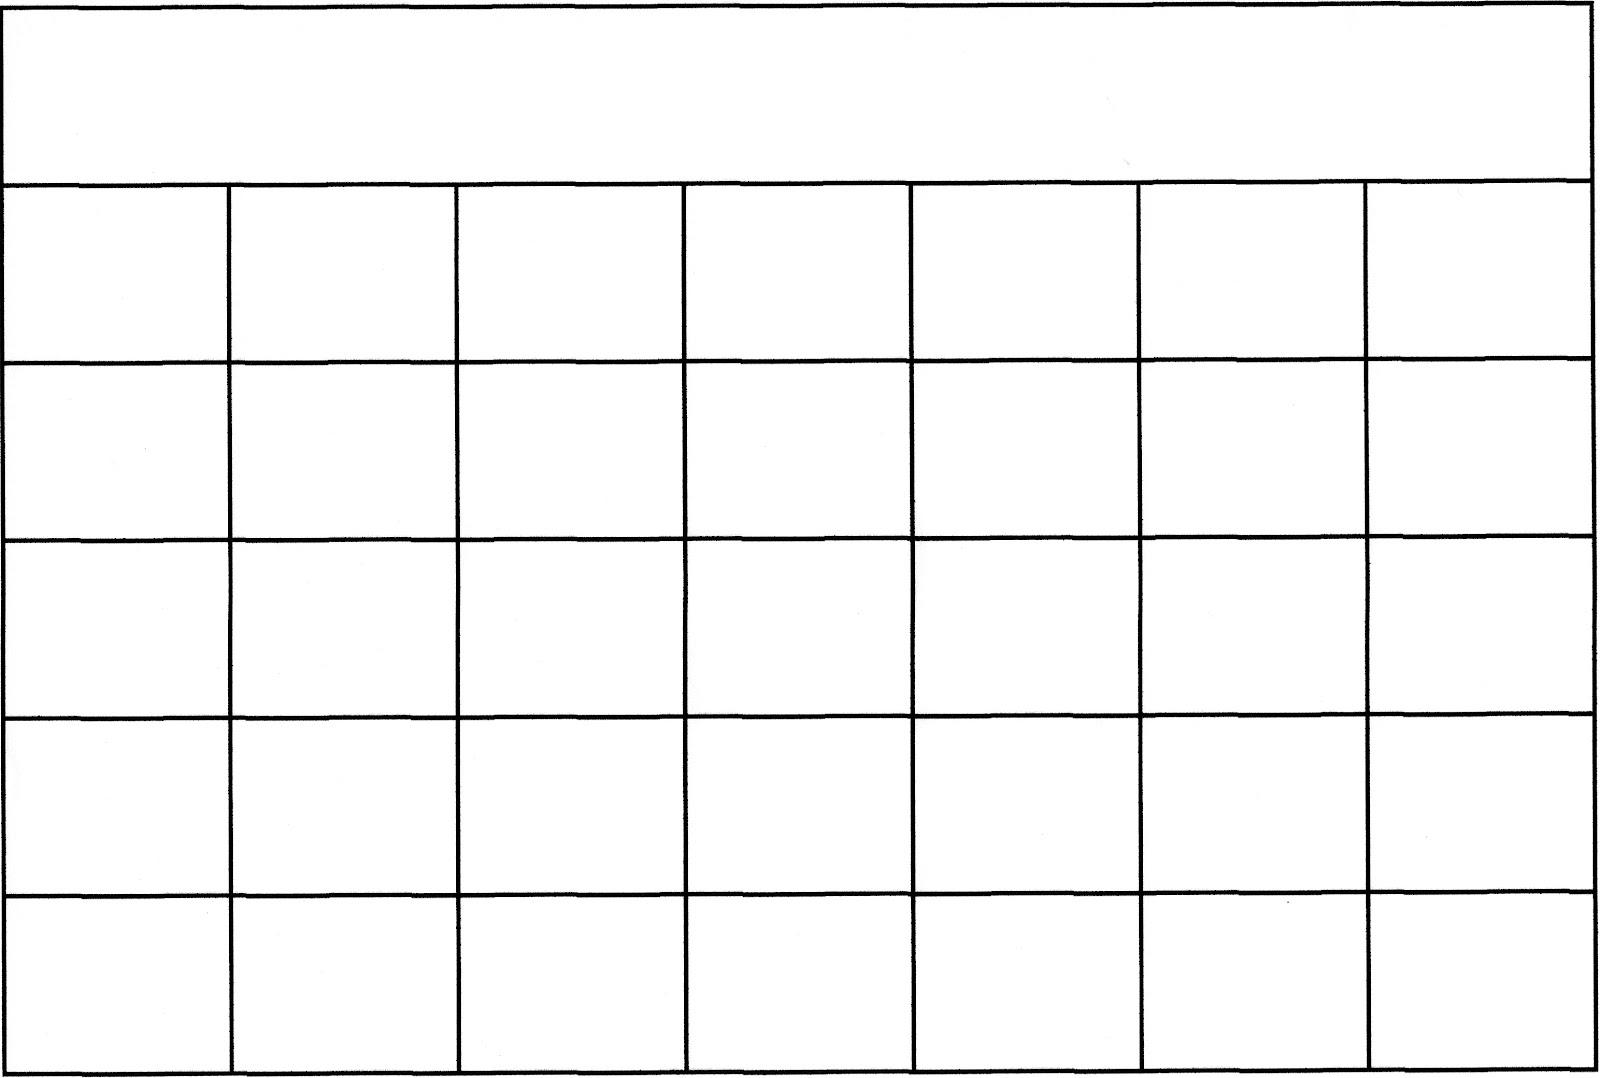 Printable 5 Day Calendar Printable Editable Blank – 5 Day Schedule Template